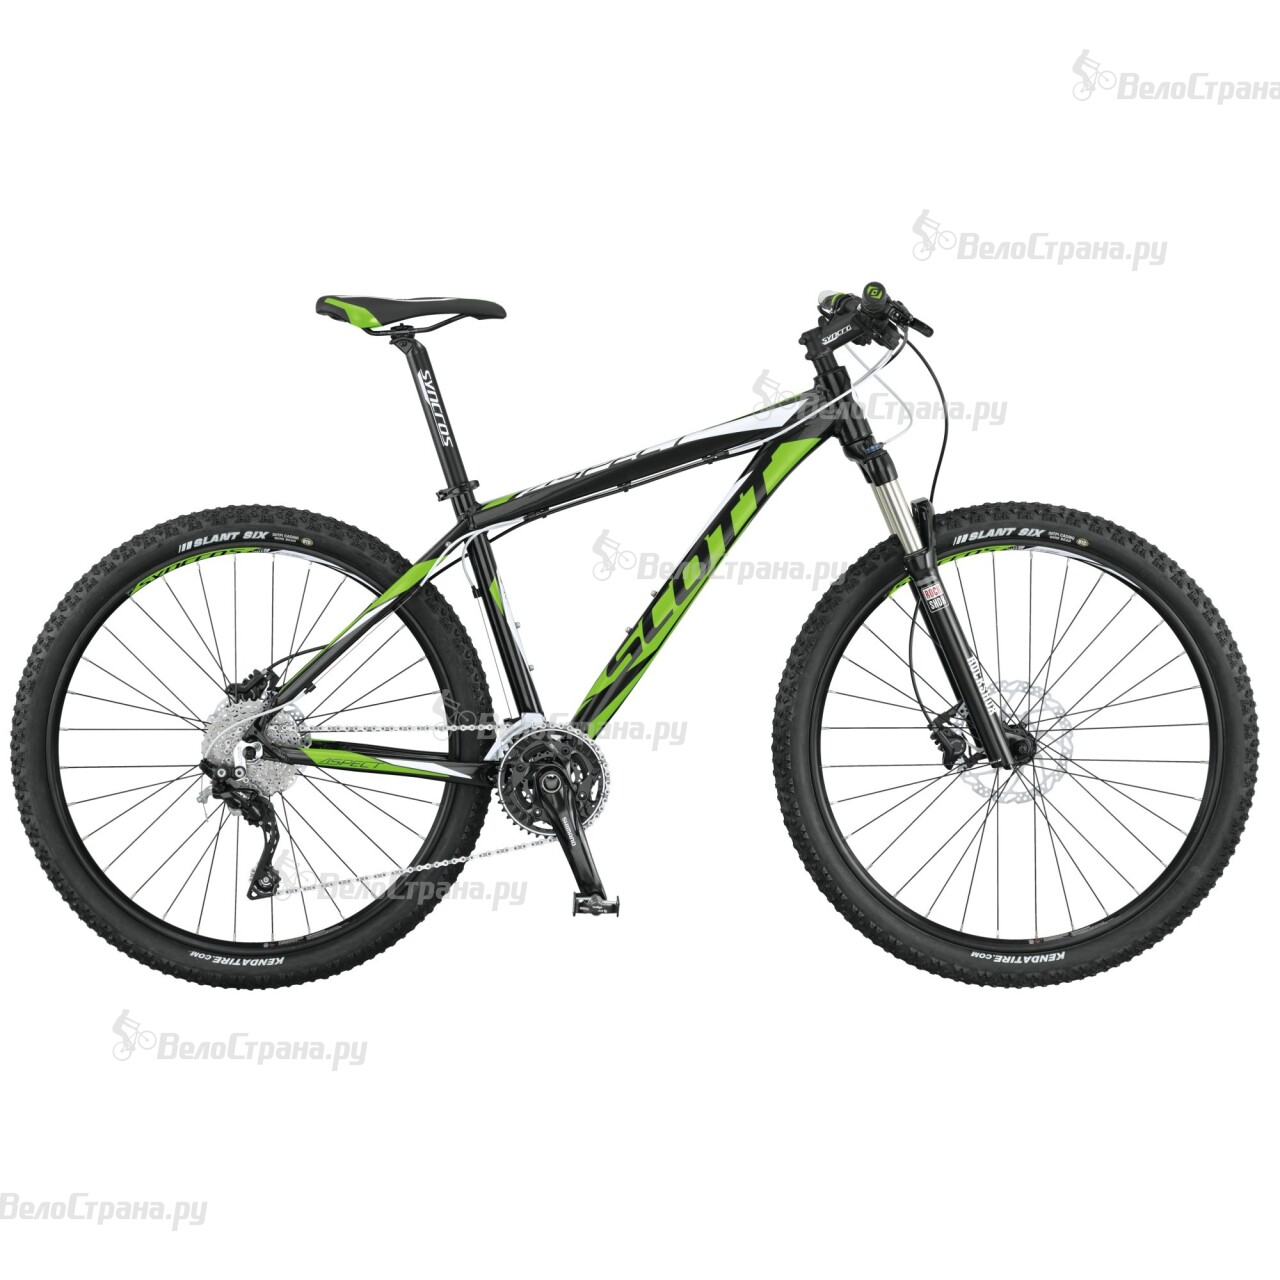 Велосипед Scott Aspect 710 (2015)